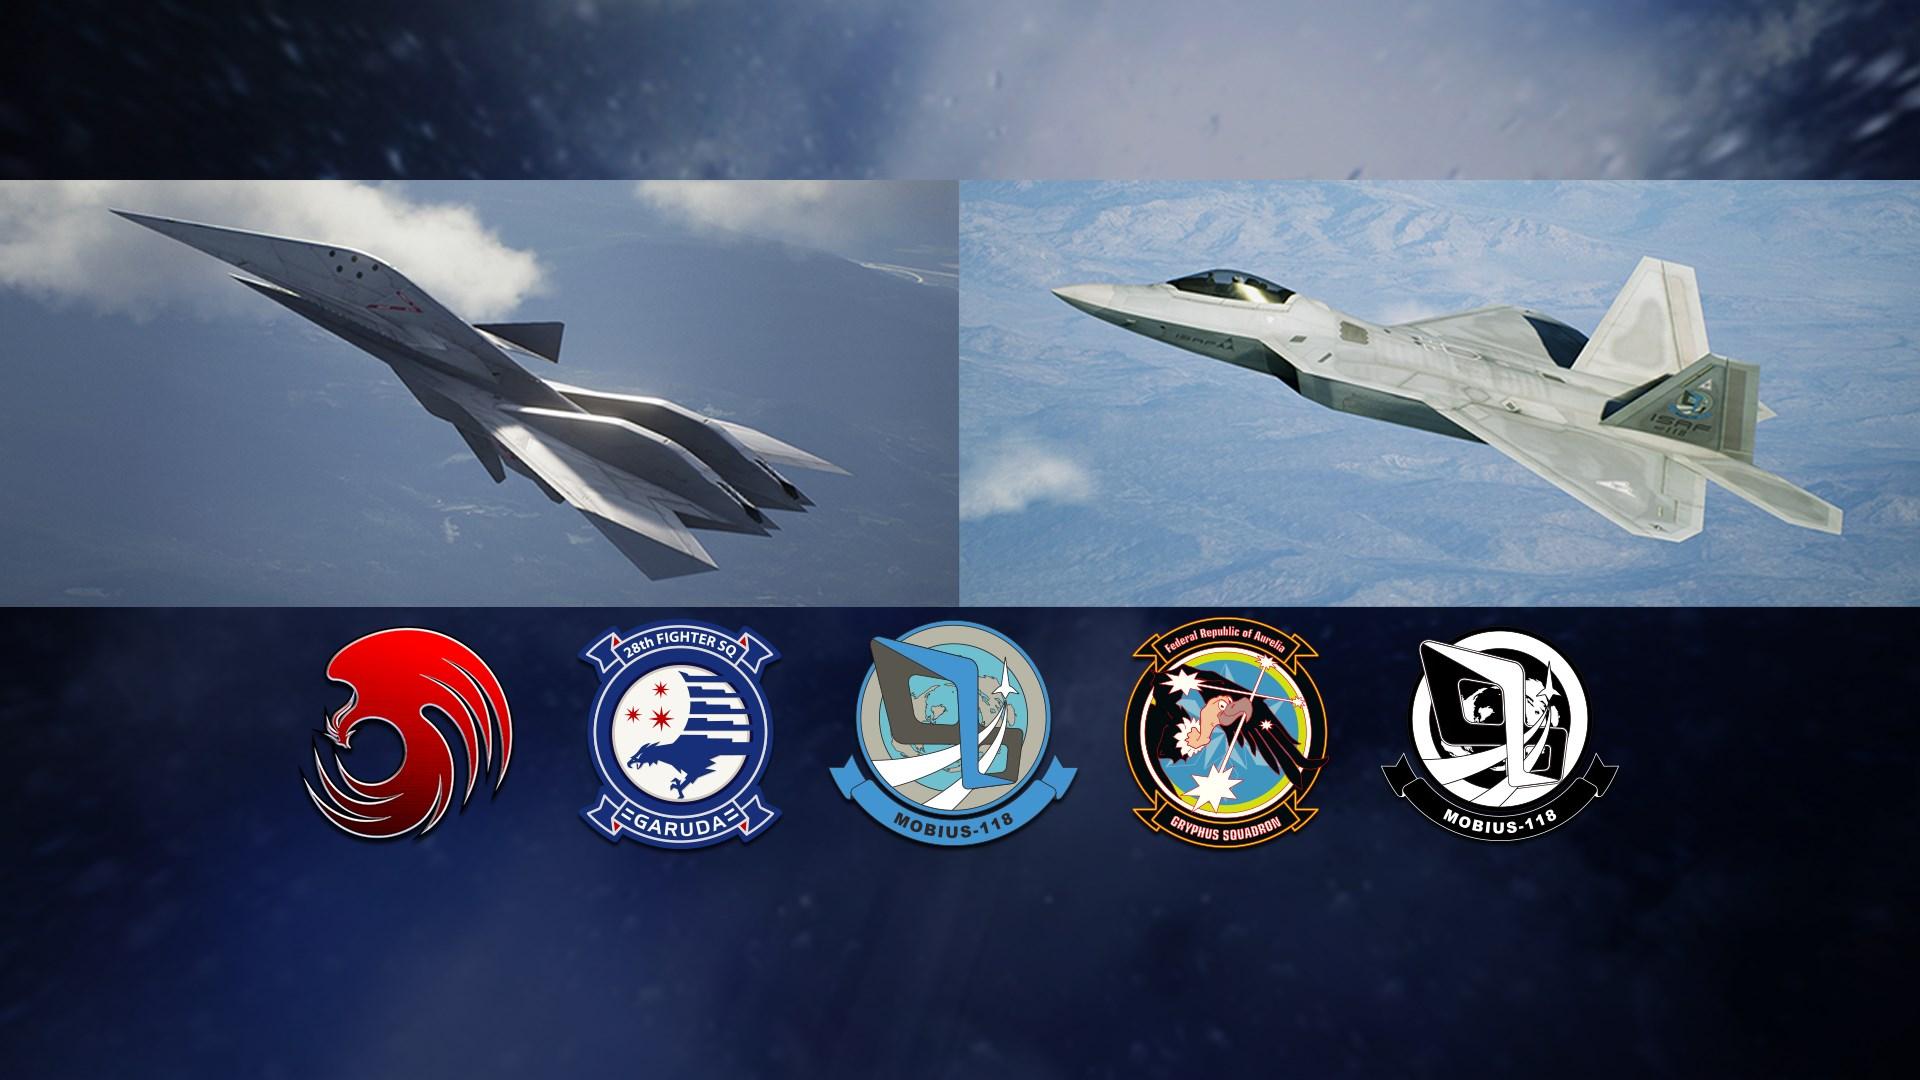 ACE COMBAT™ 7: SKIES UNKNOWN - ADF-11F Raven Set